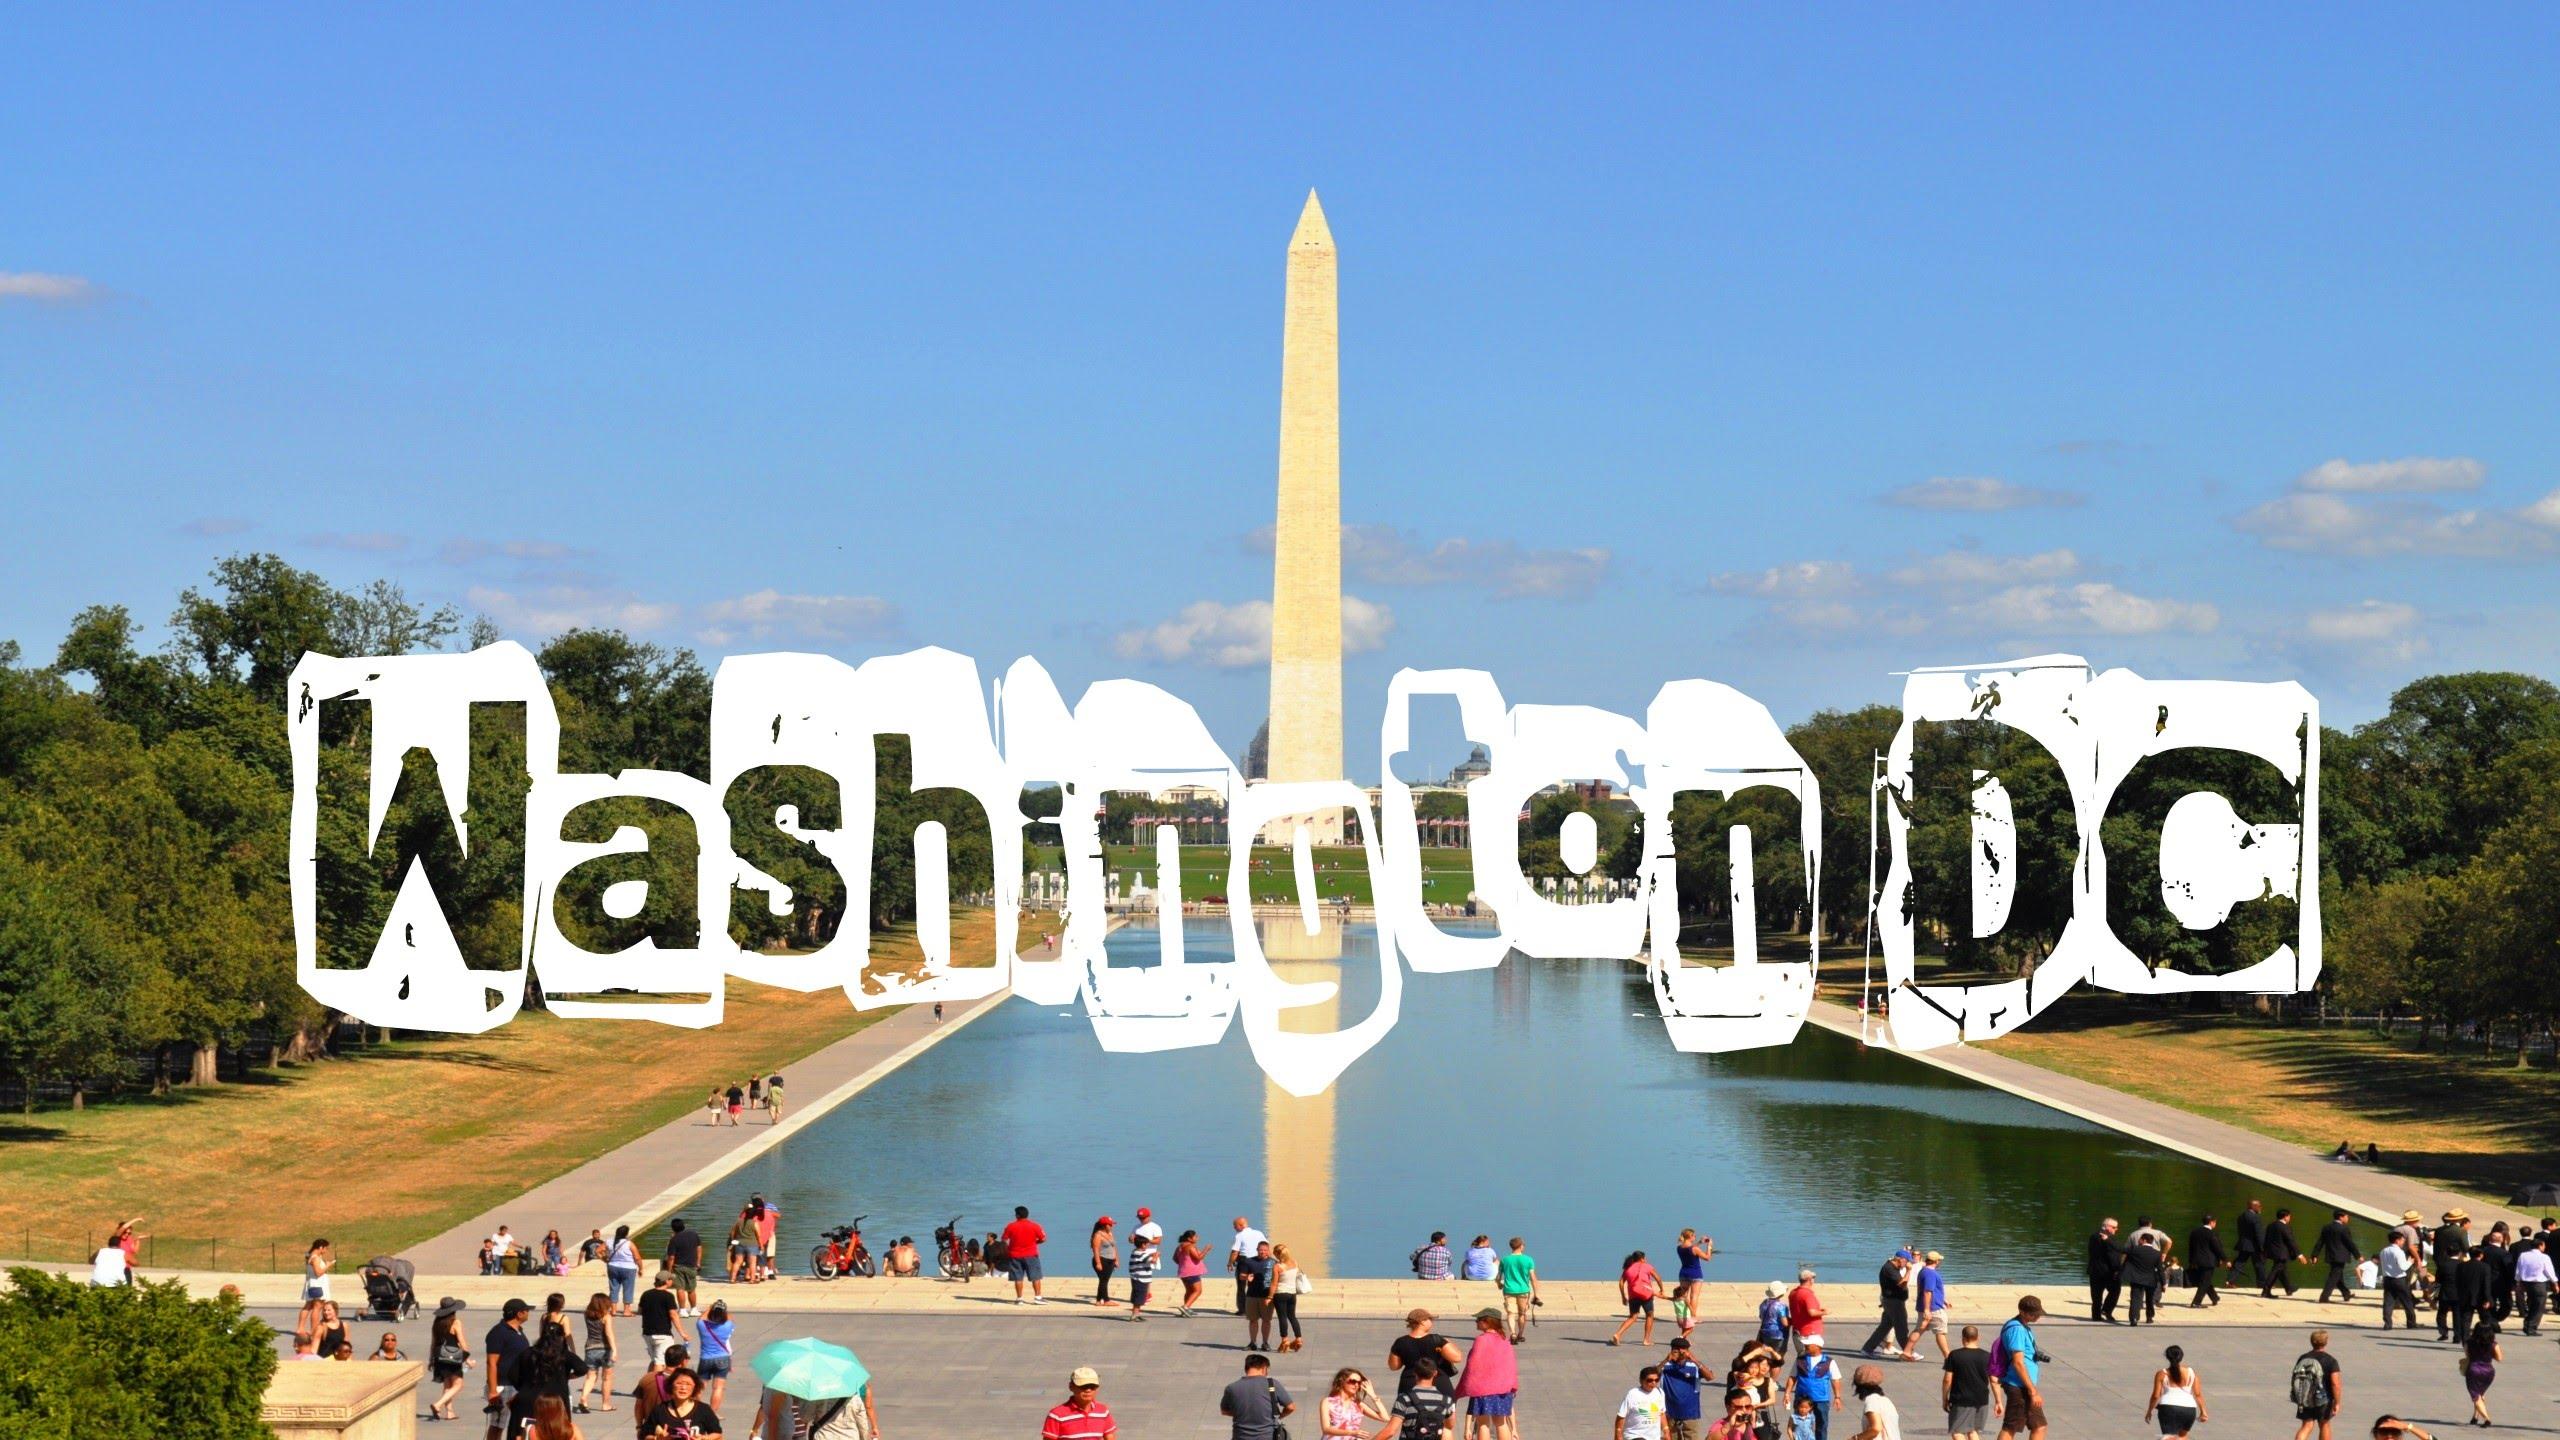 Top 10 things to do in Washington DC. Visit Washington DC - YouTube